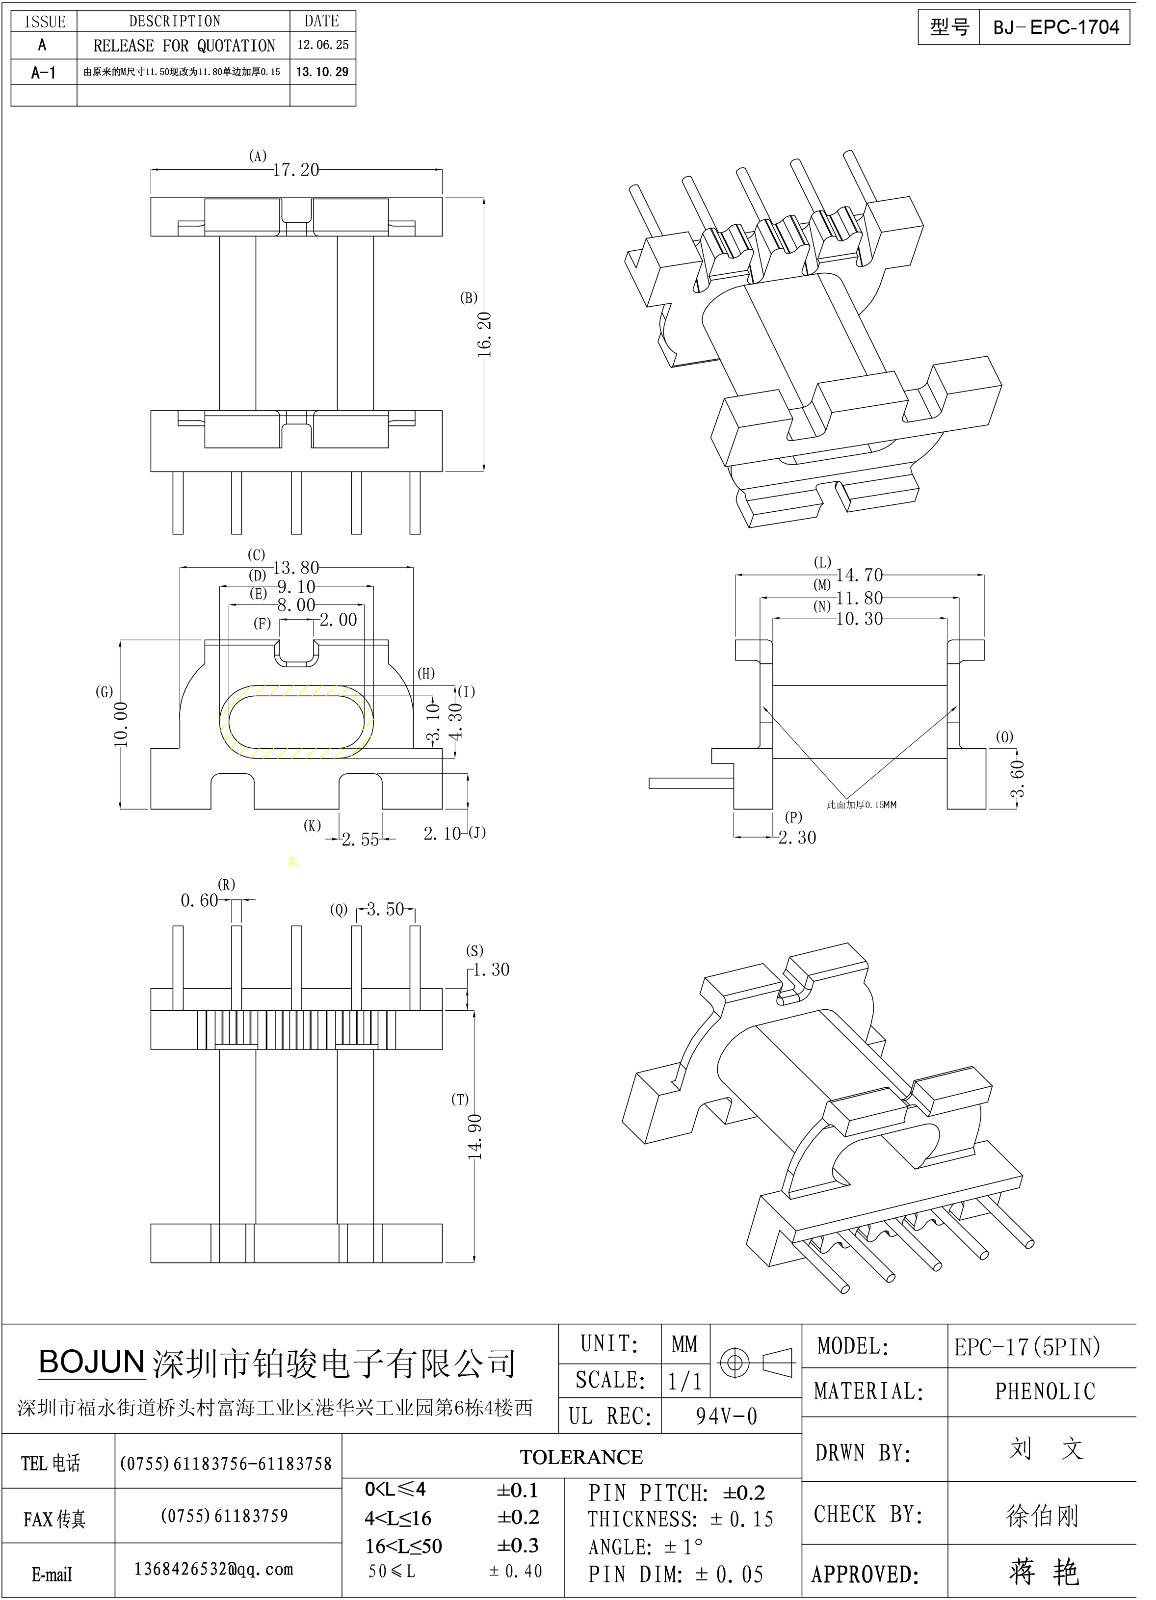 EPC-1704-Model-(1).jpg